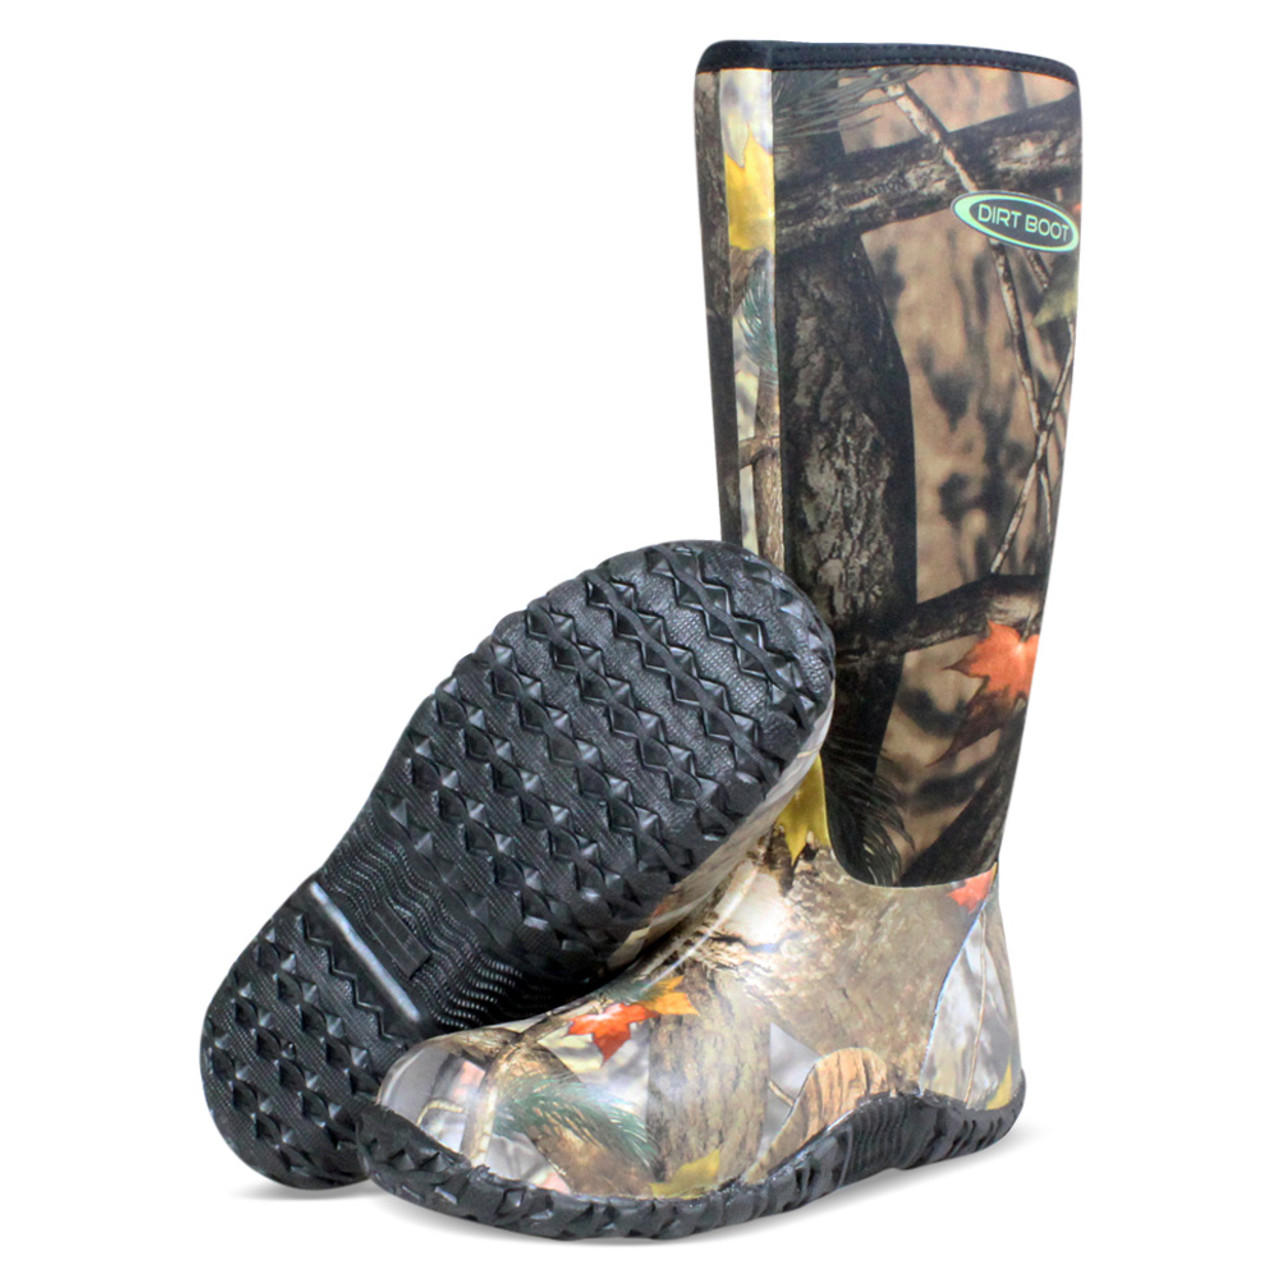 Dirt Boot® Neoprene Wellington Sock Fishing Hunting Muck Socks Camo